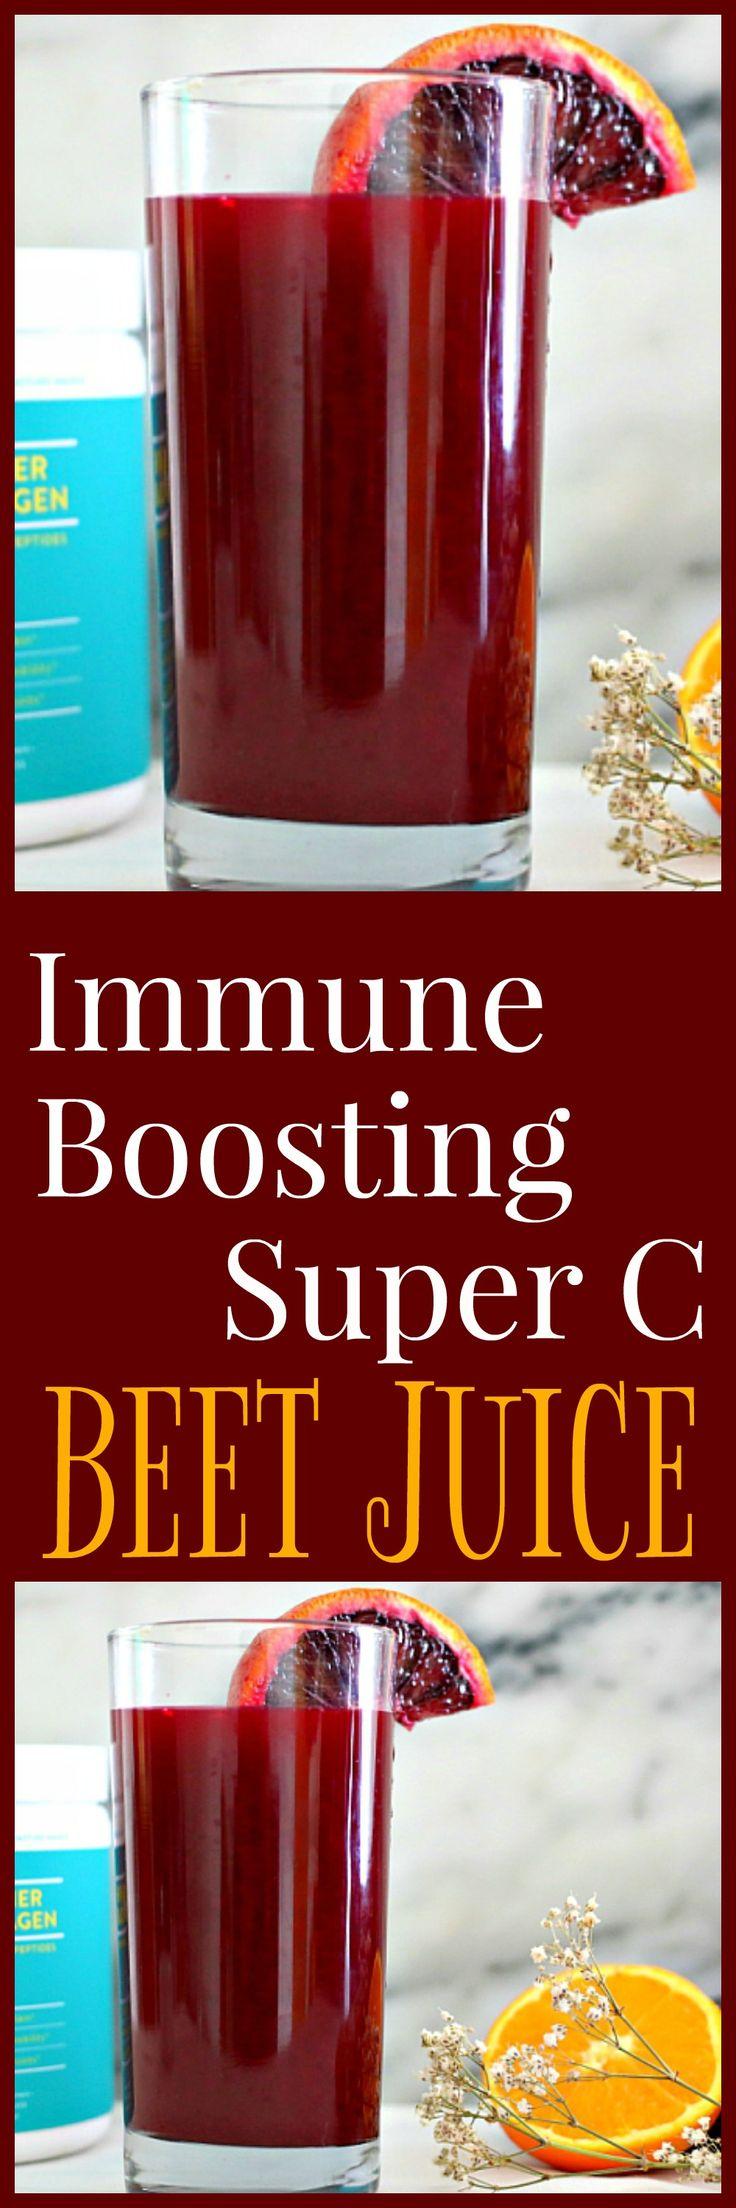 http://www.furtherfood.com/recipe/immune-boosting-super-c-beet-juice-further-collagen-heart-healthy/